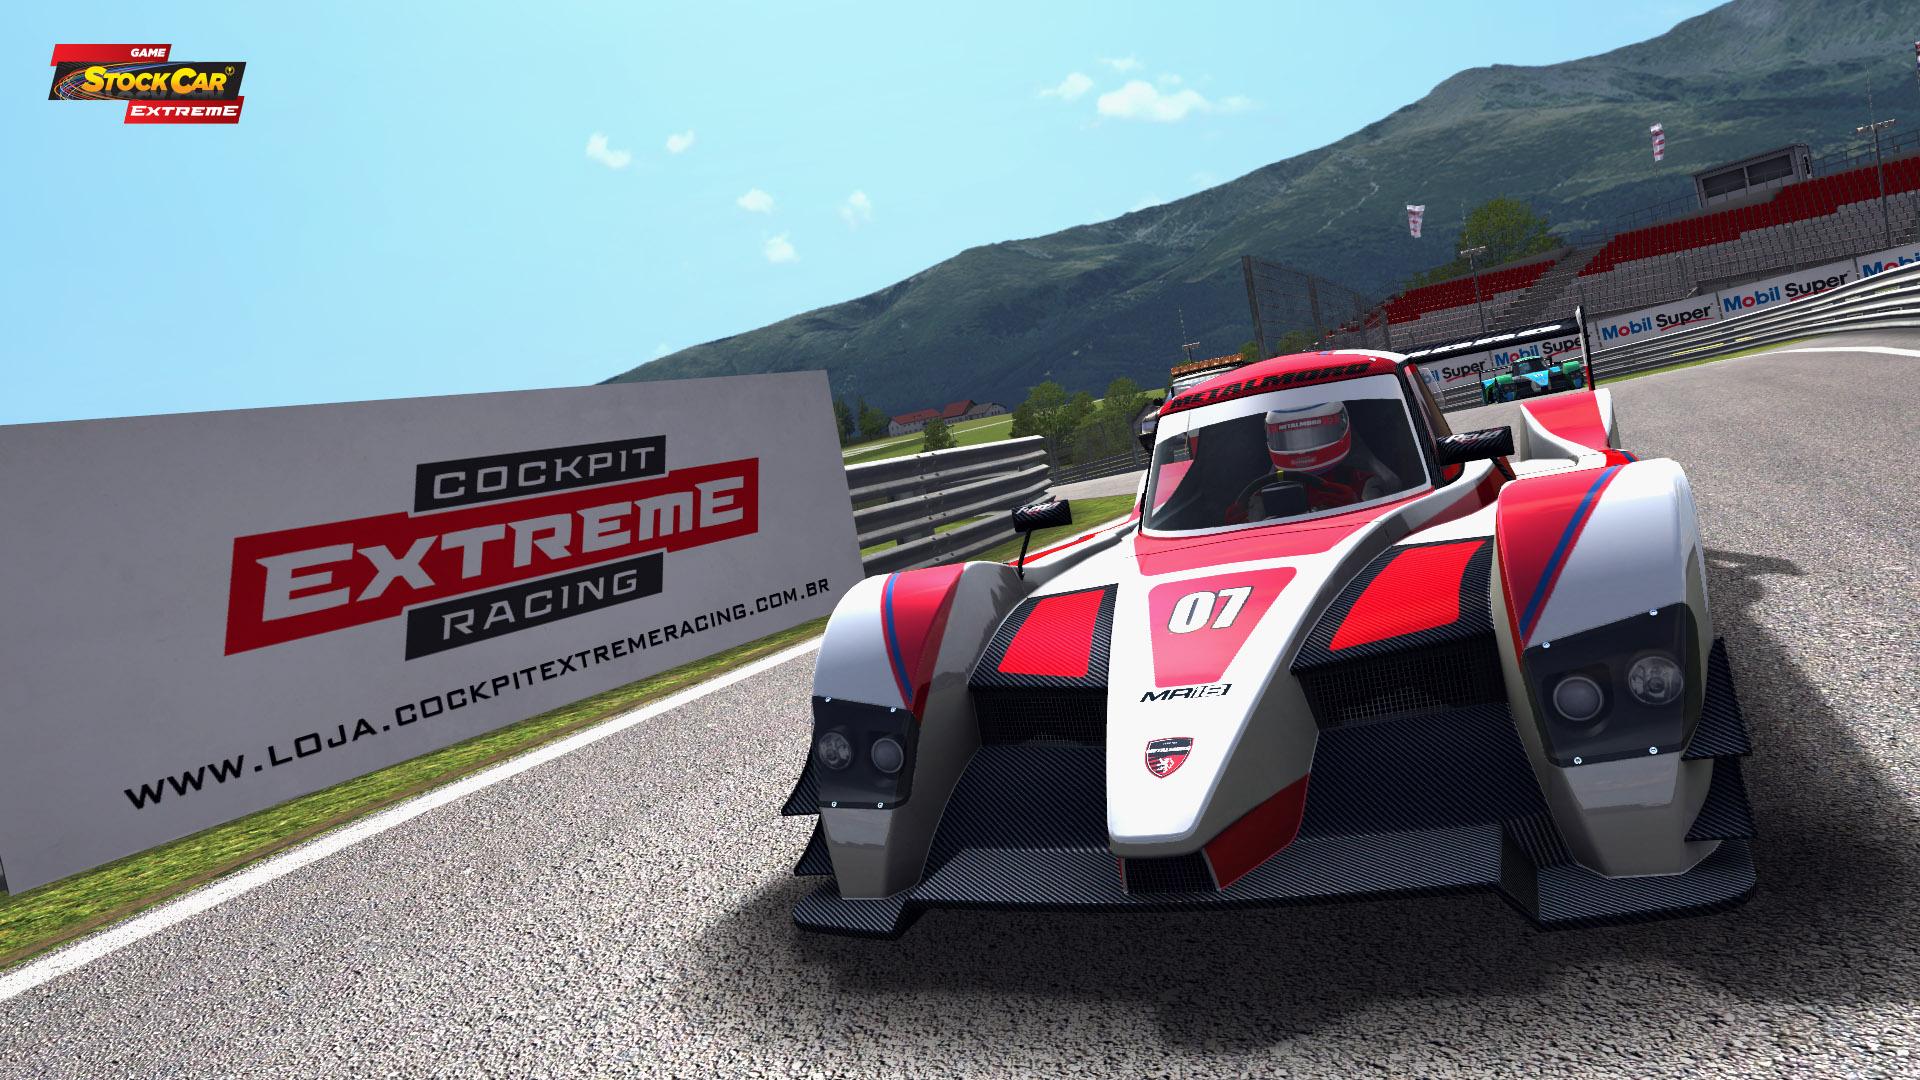 MR18 Game Stock Car Extreme.jpg